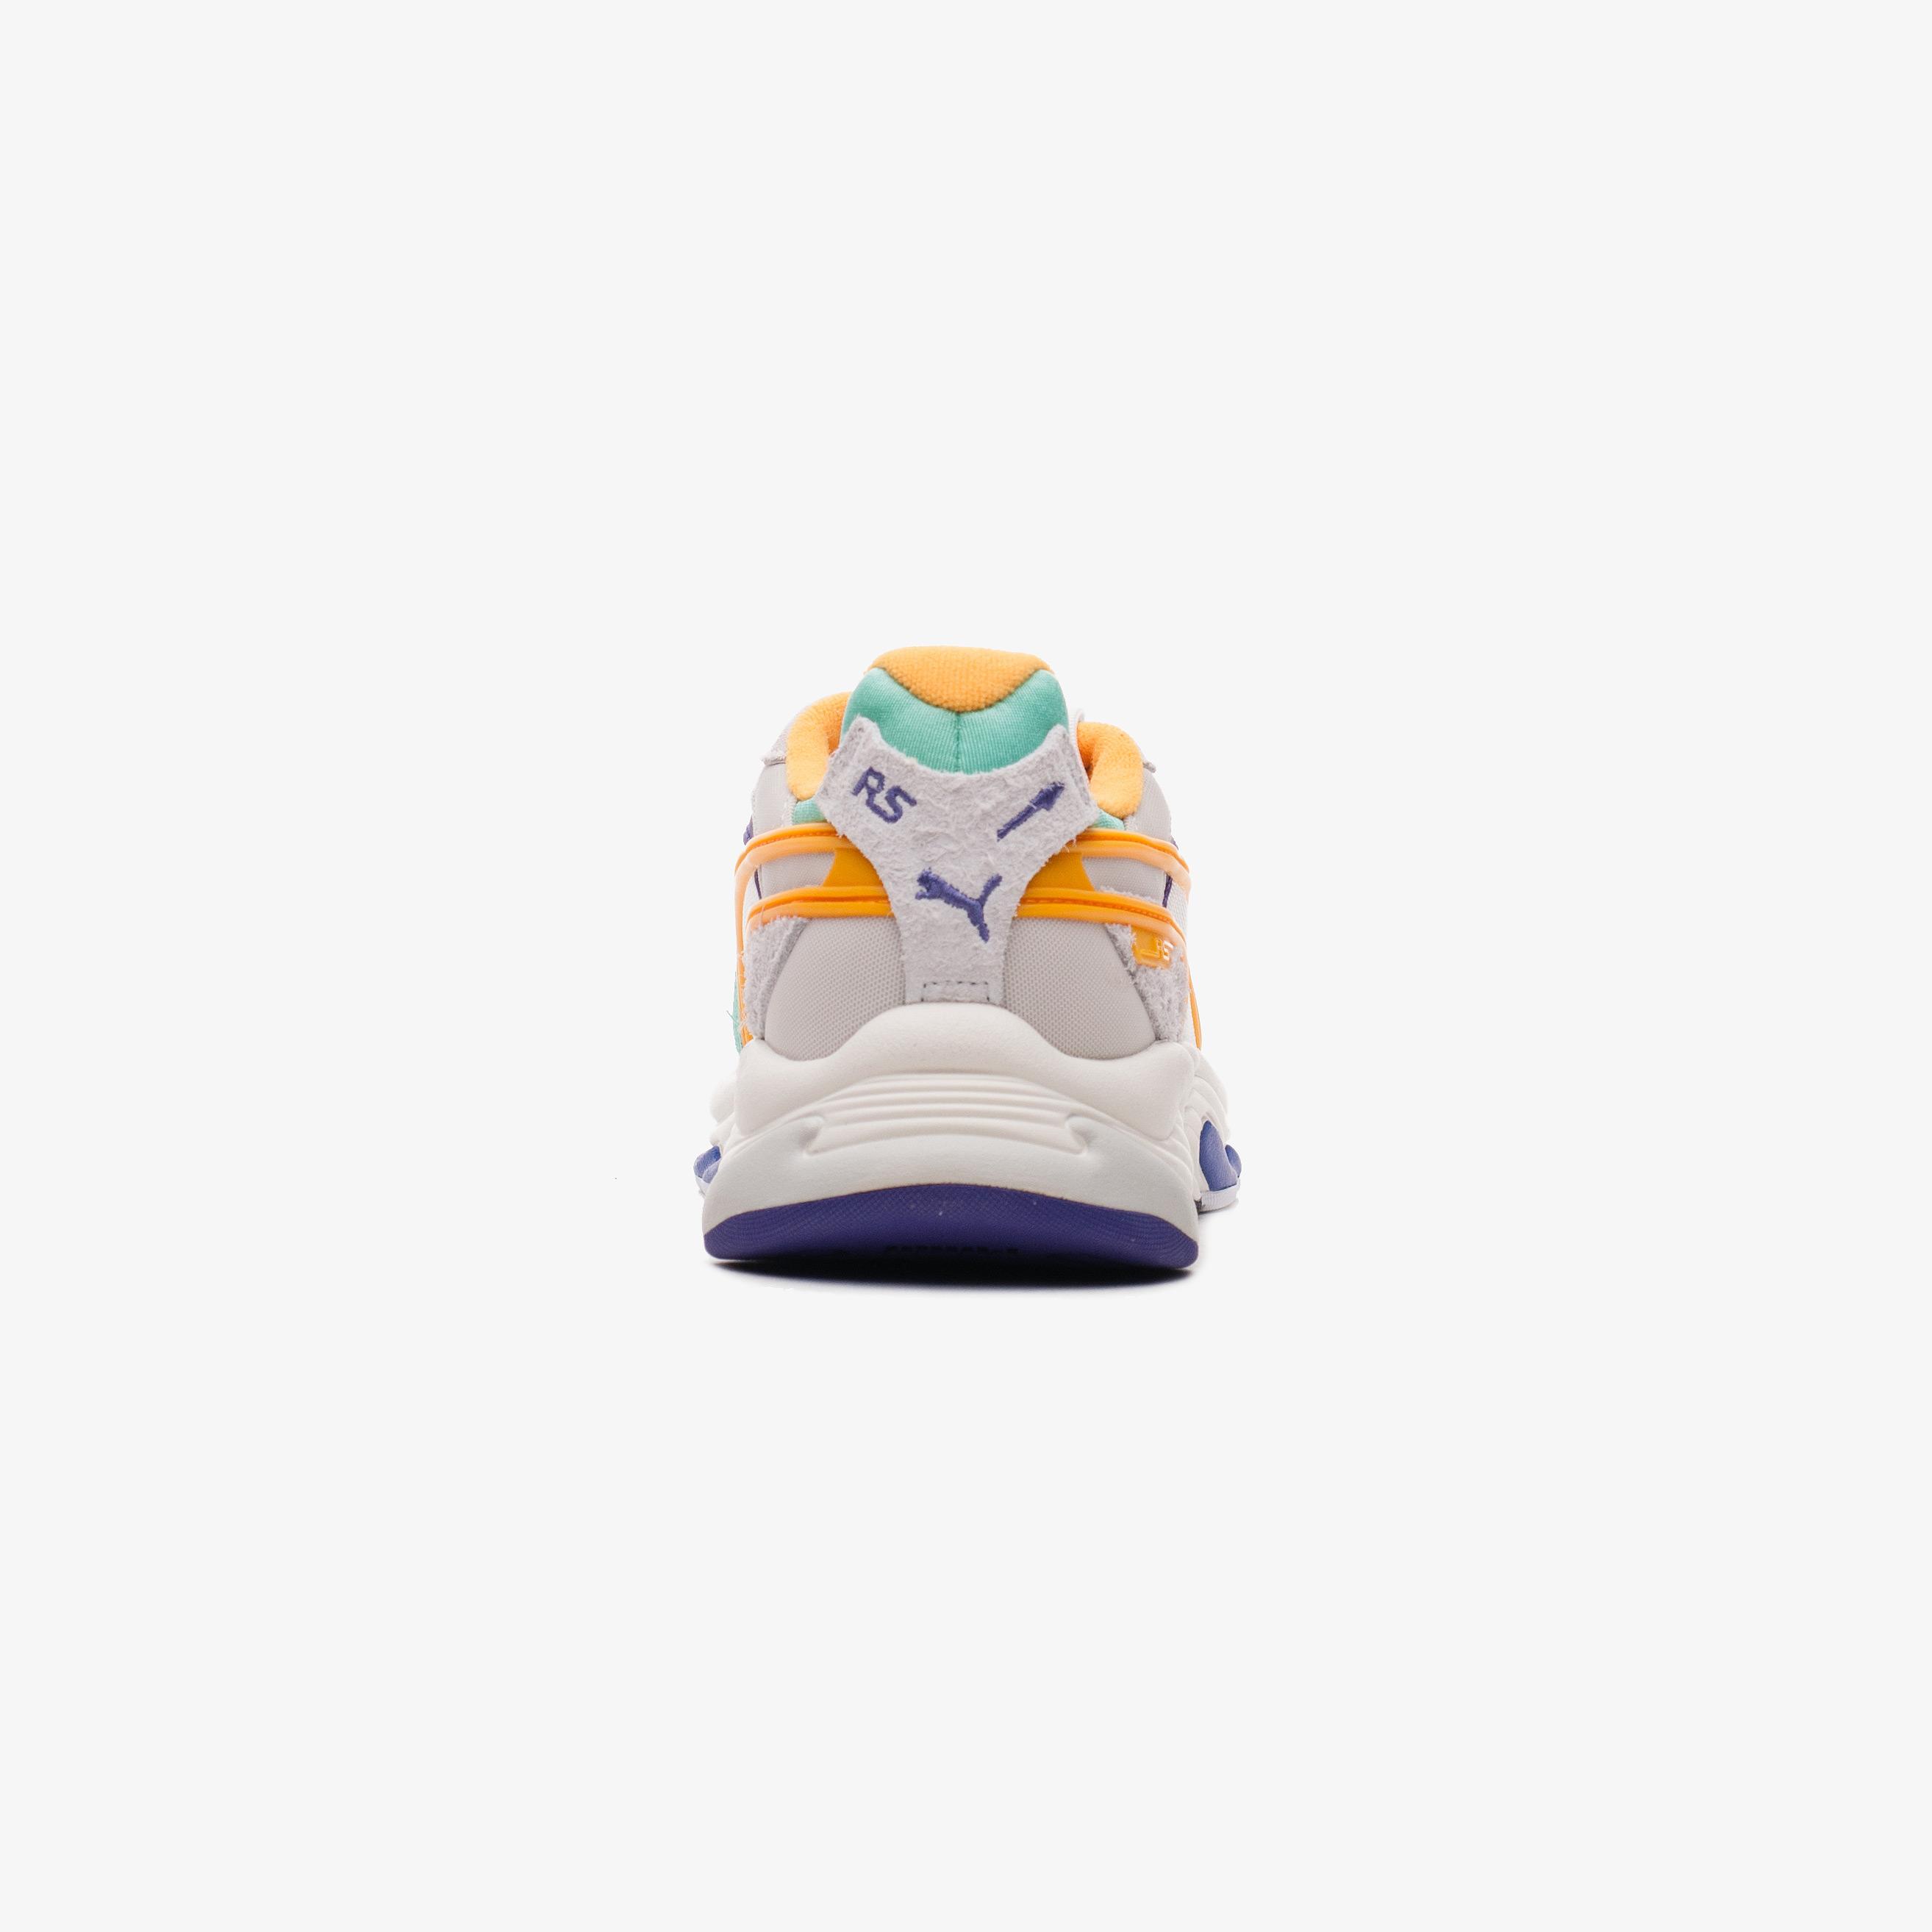 Унісекс кросівки Puma RS-CONNECT